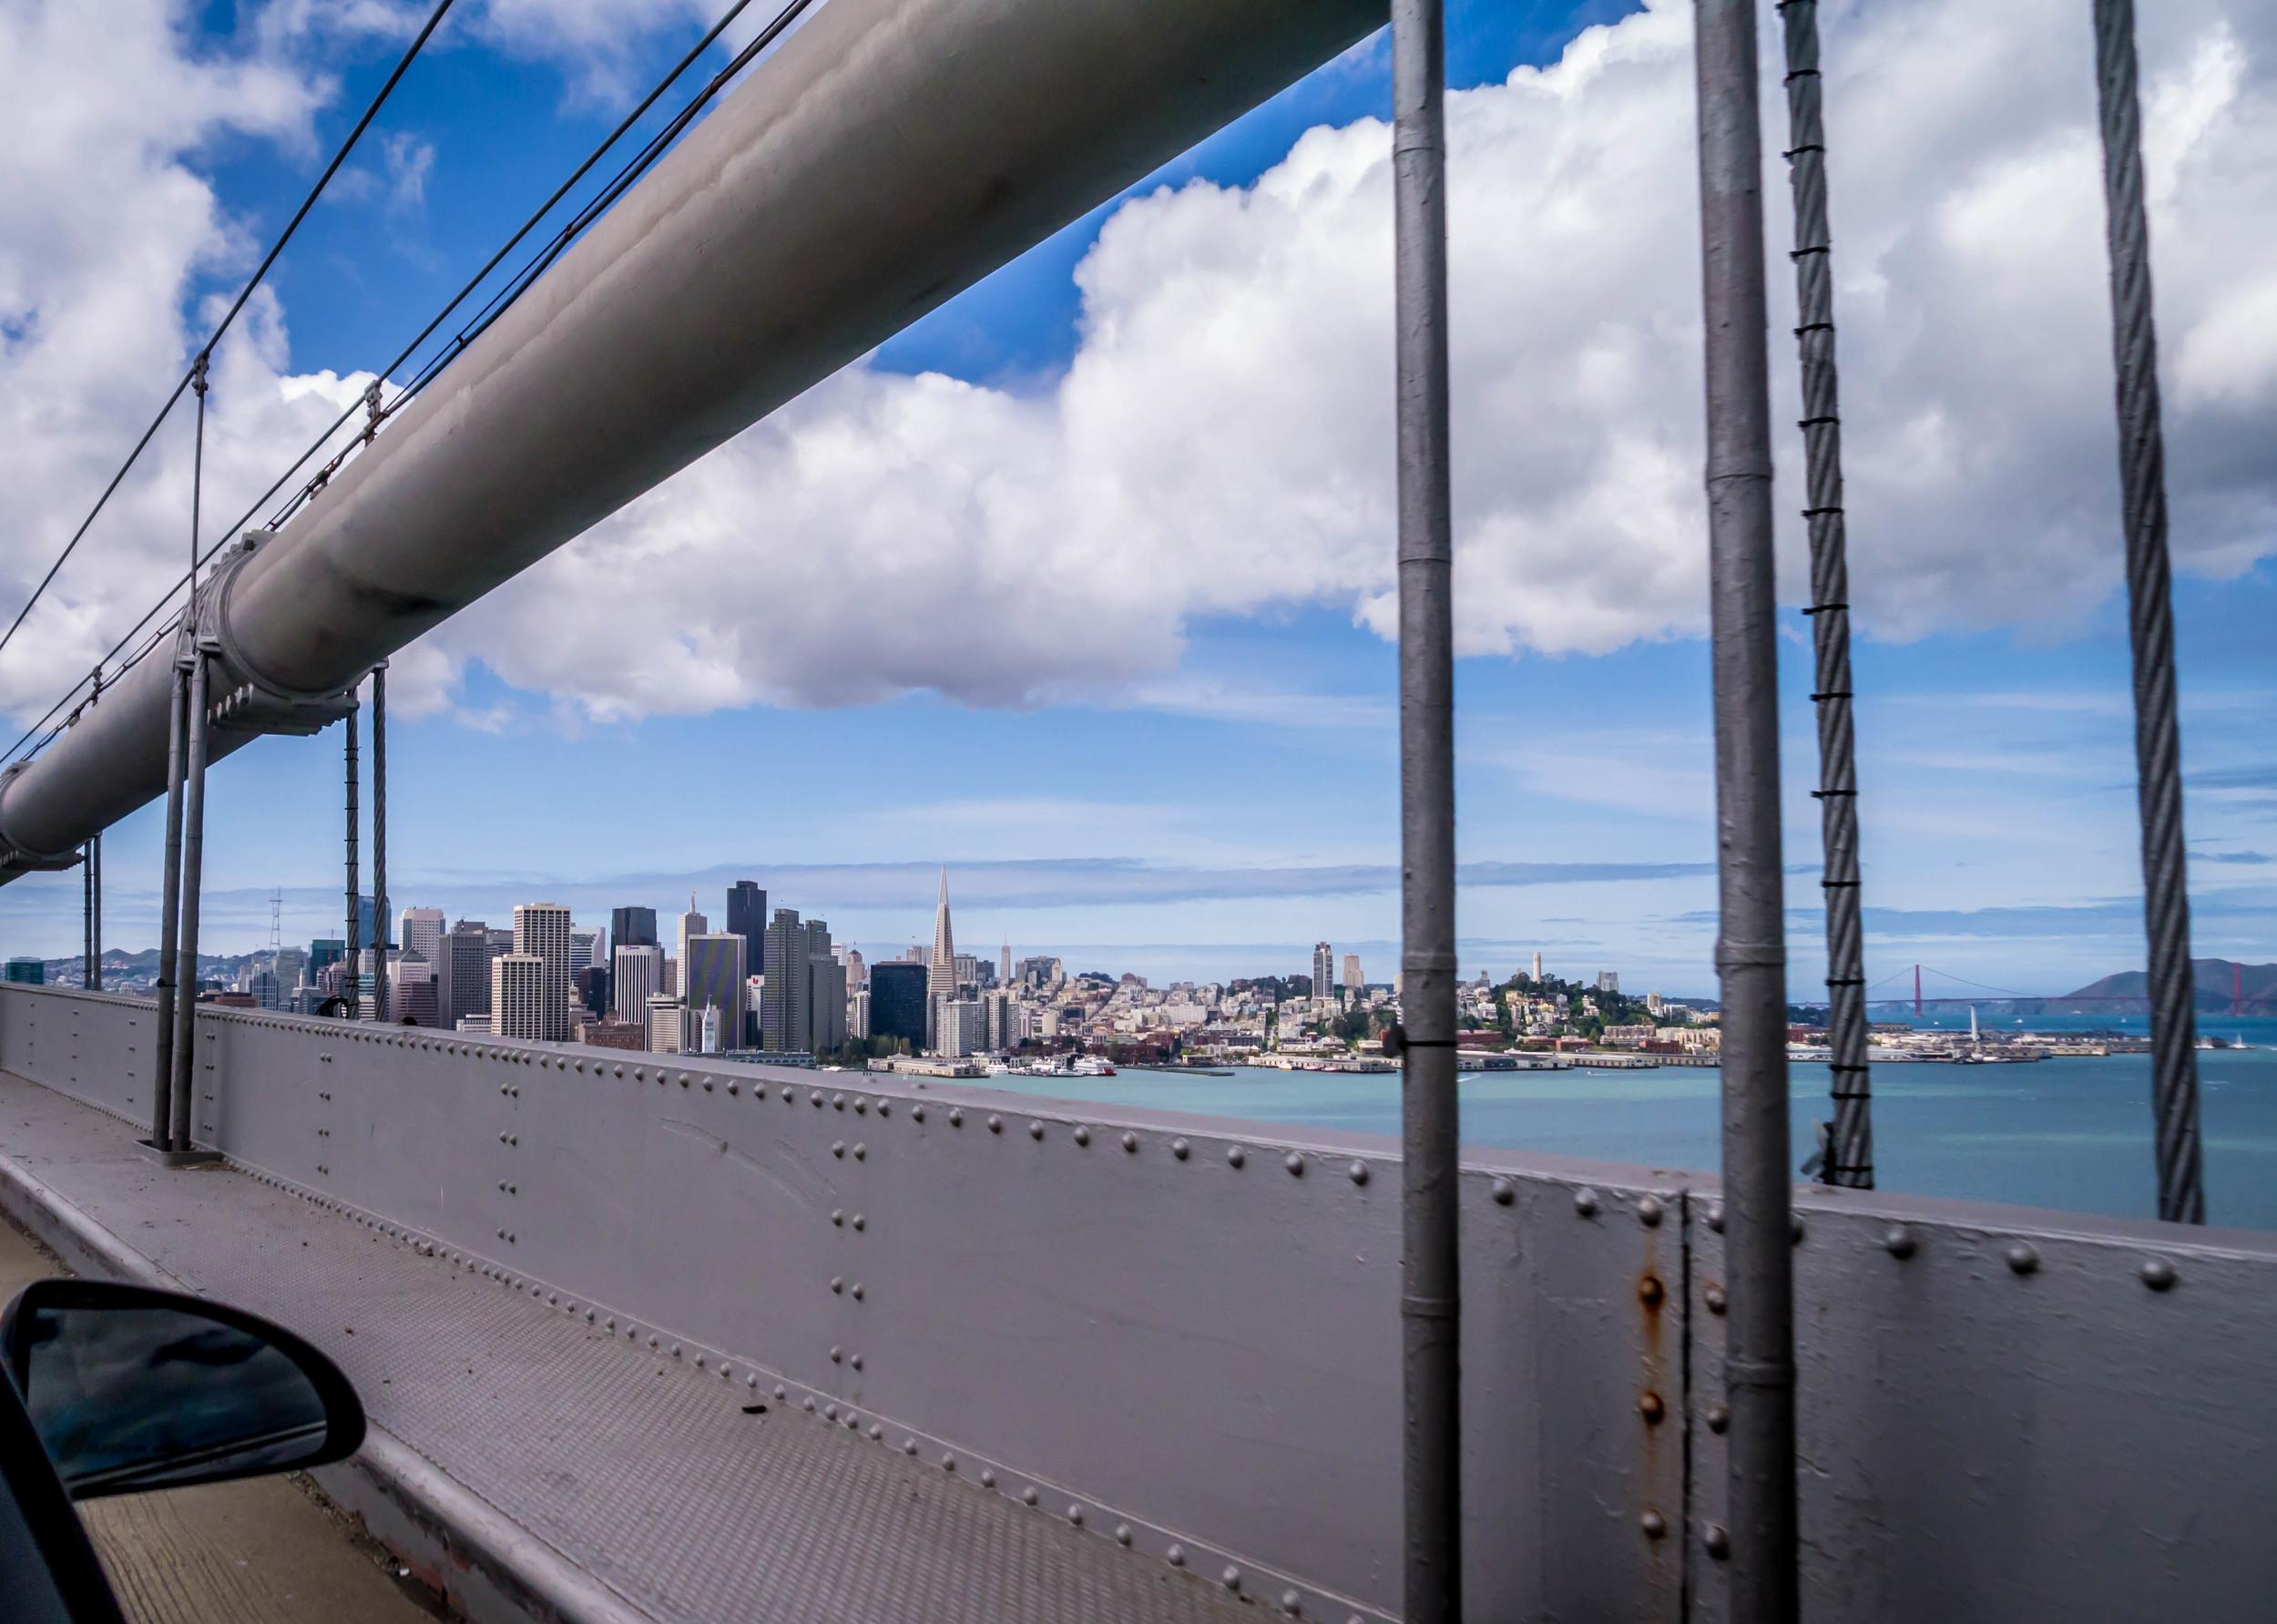 A bridge under fluffy white clouds